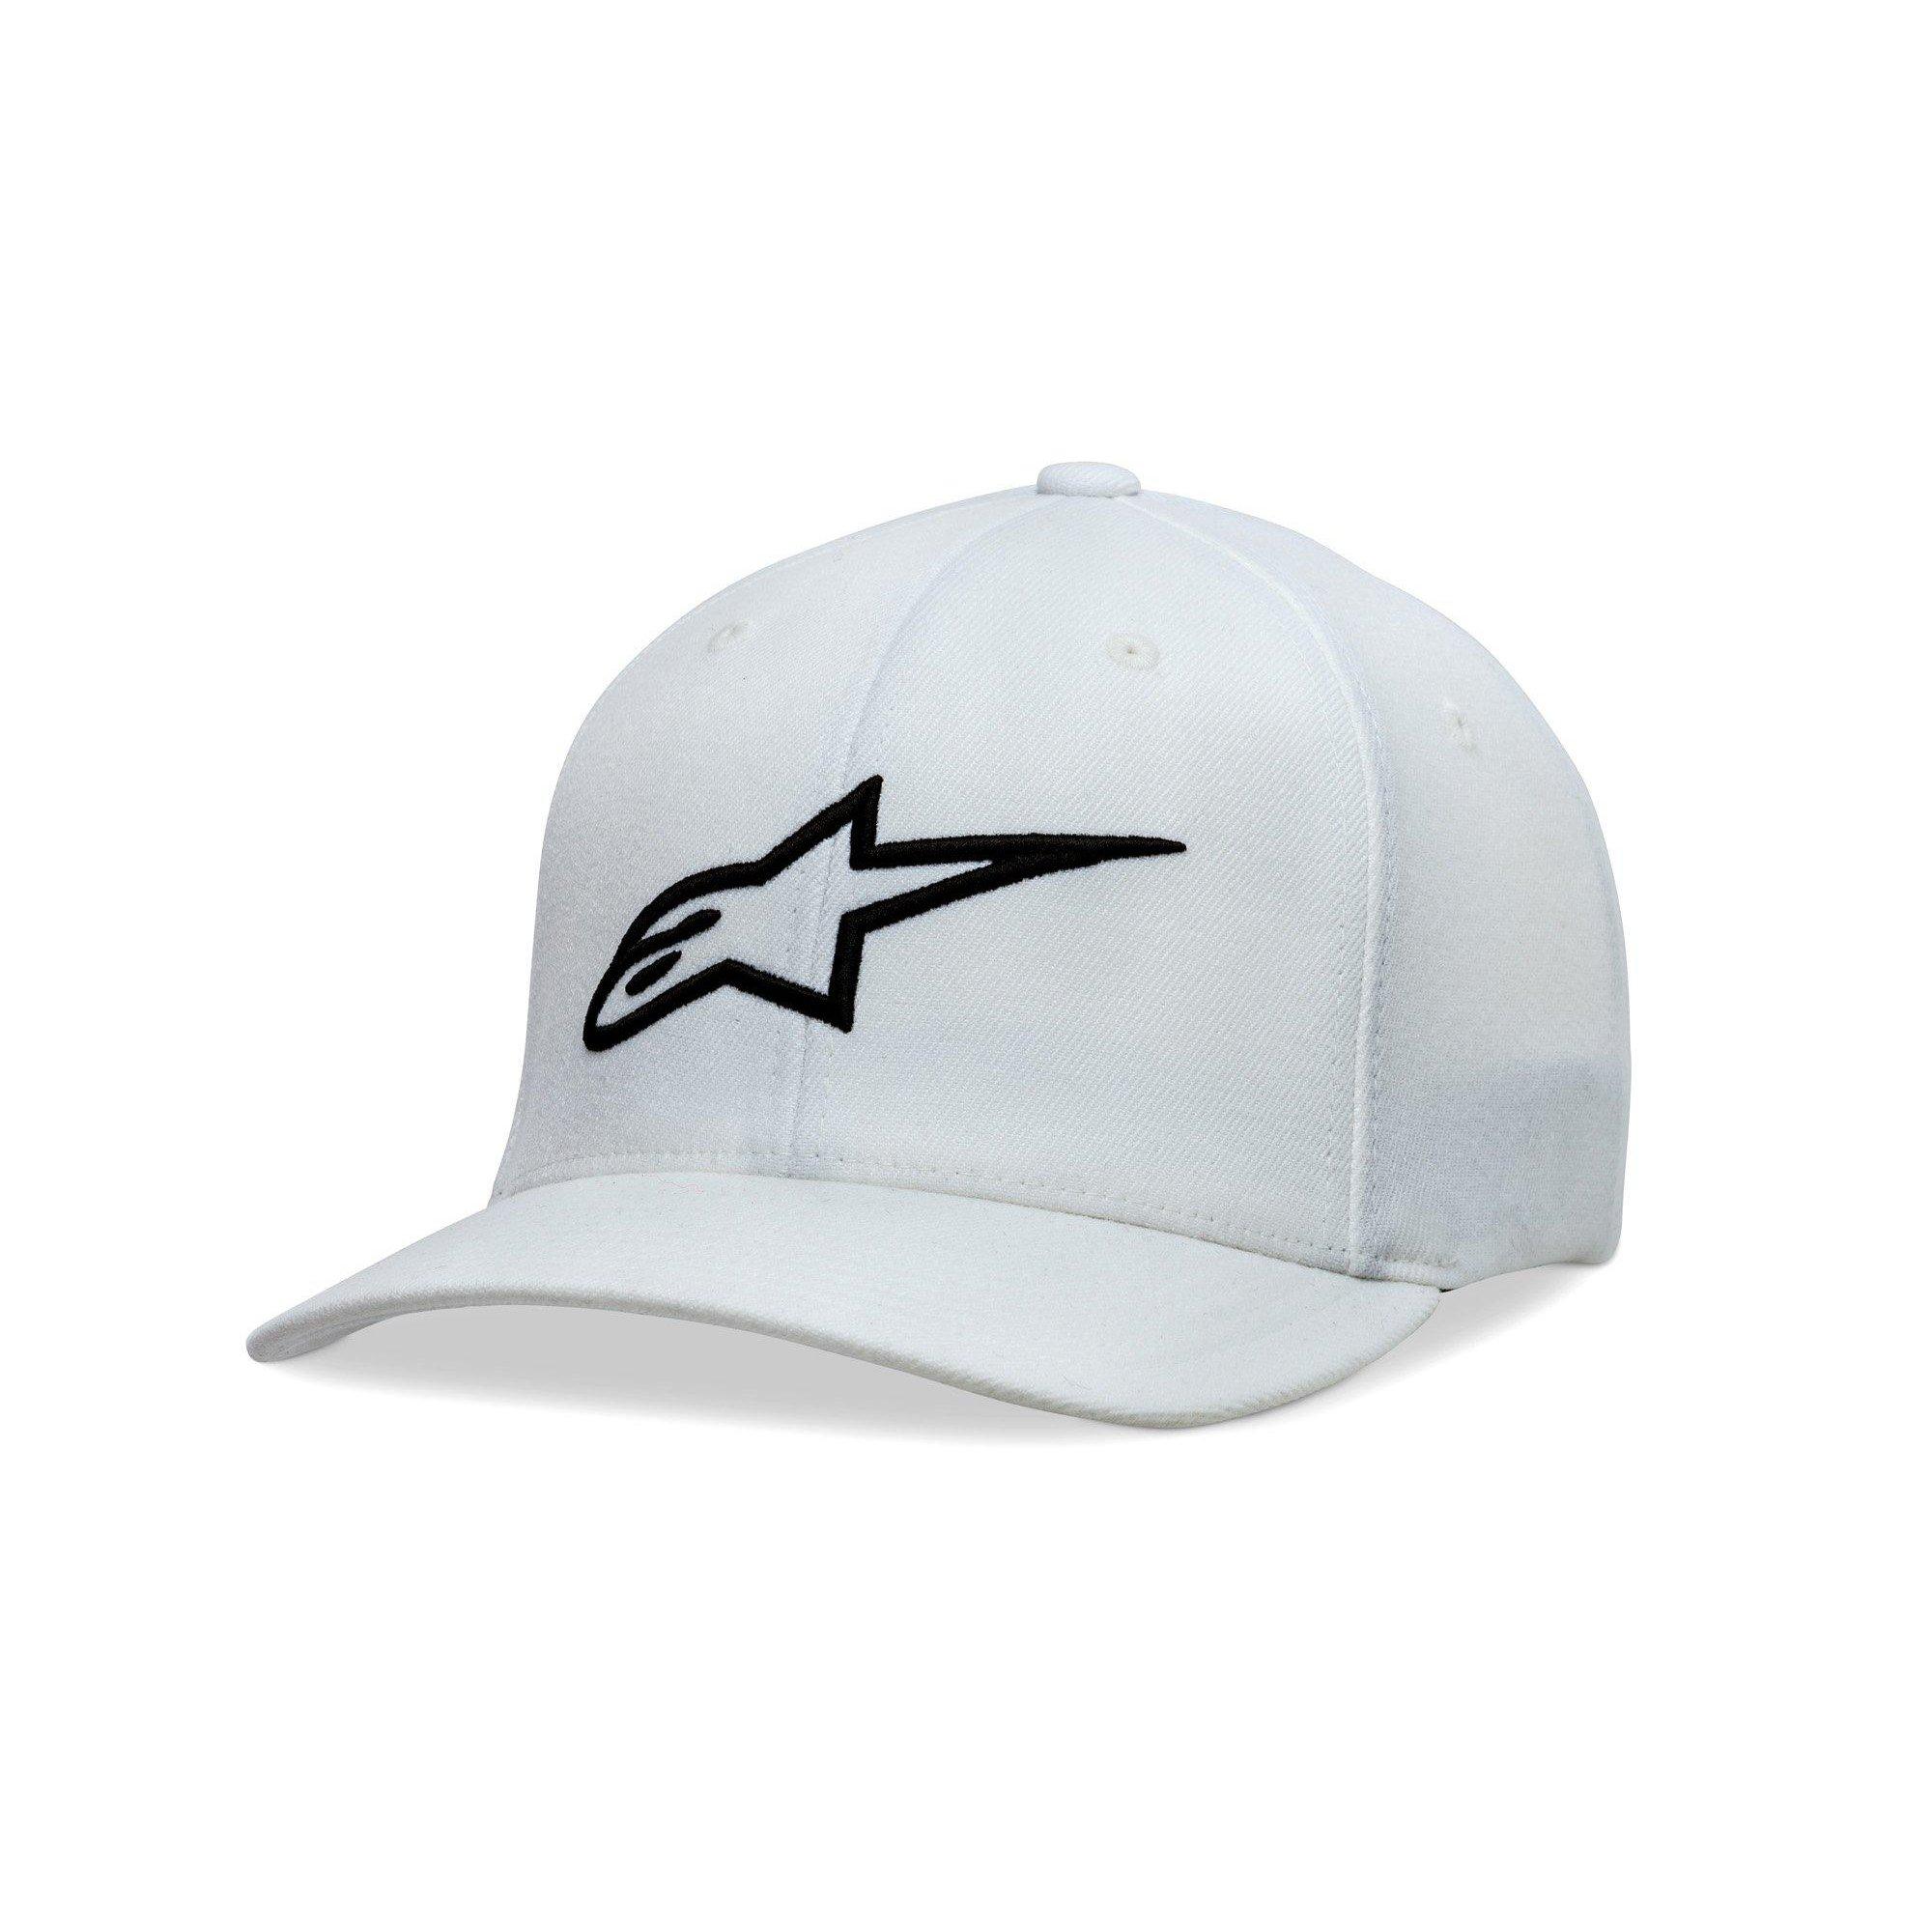 Alpinestars Ageless Curve Black/White Hat